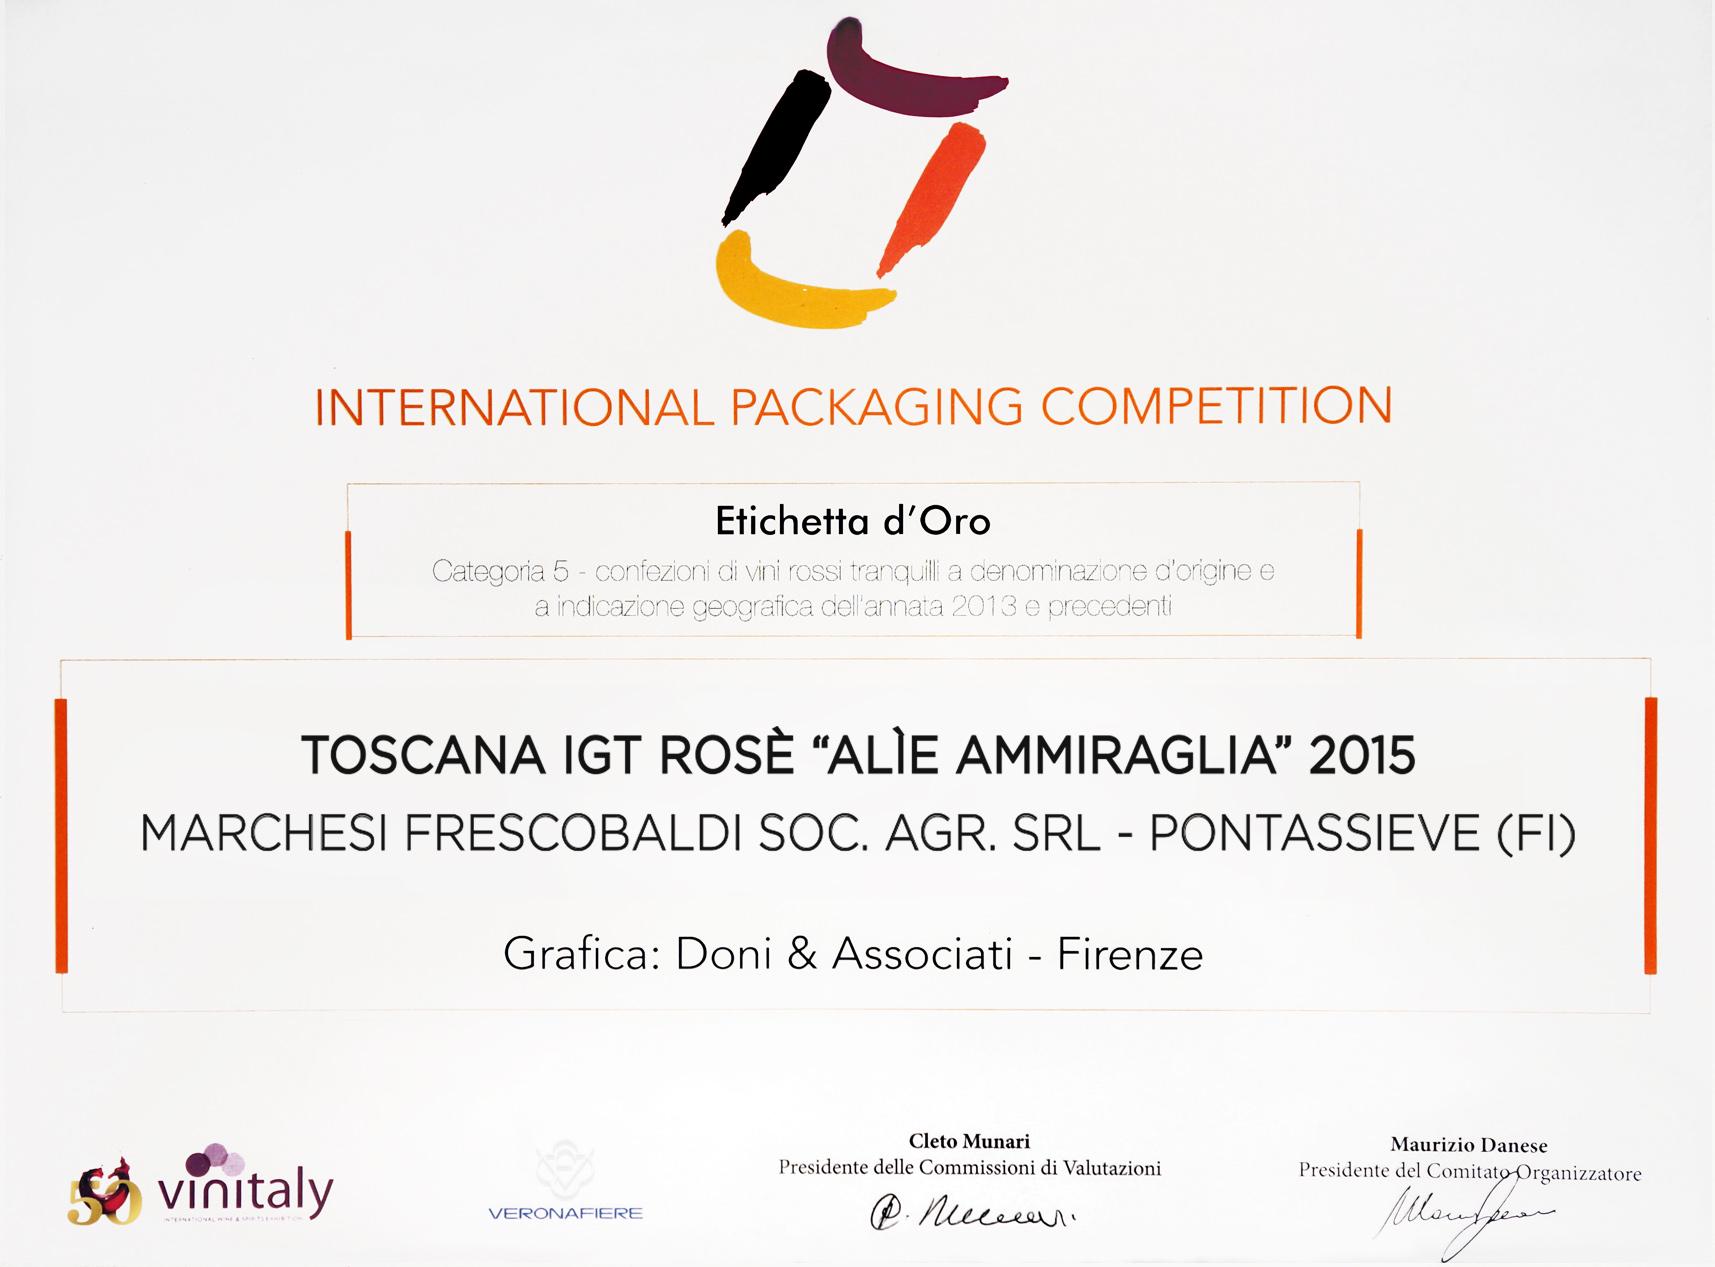 doni-etichetta-oro-frescobaldi-vinitaly-2016